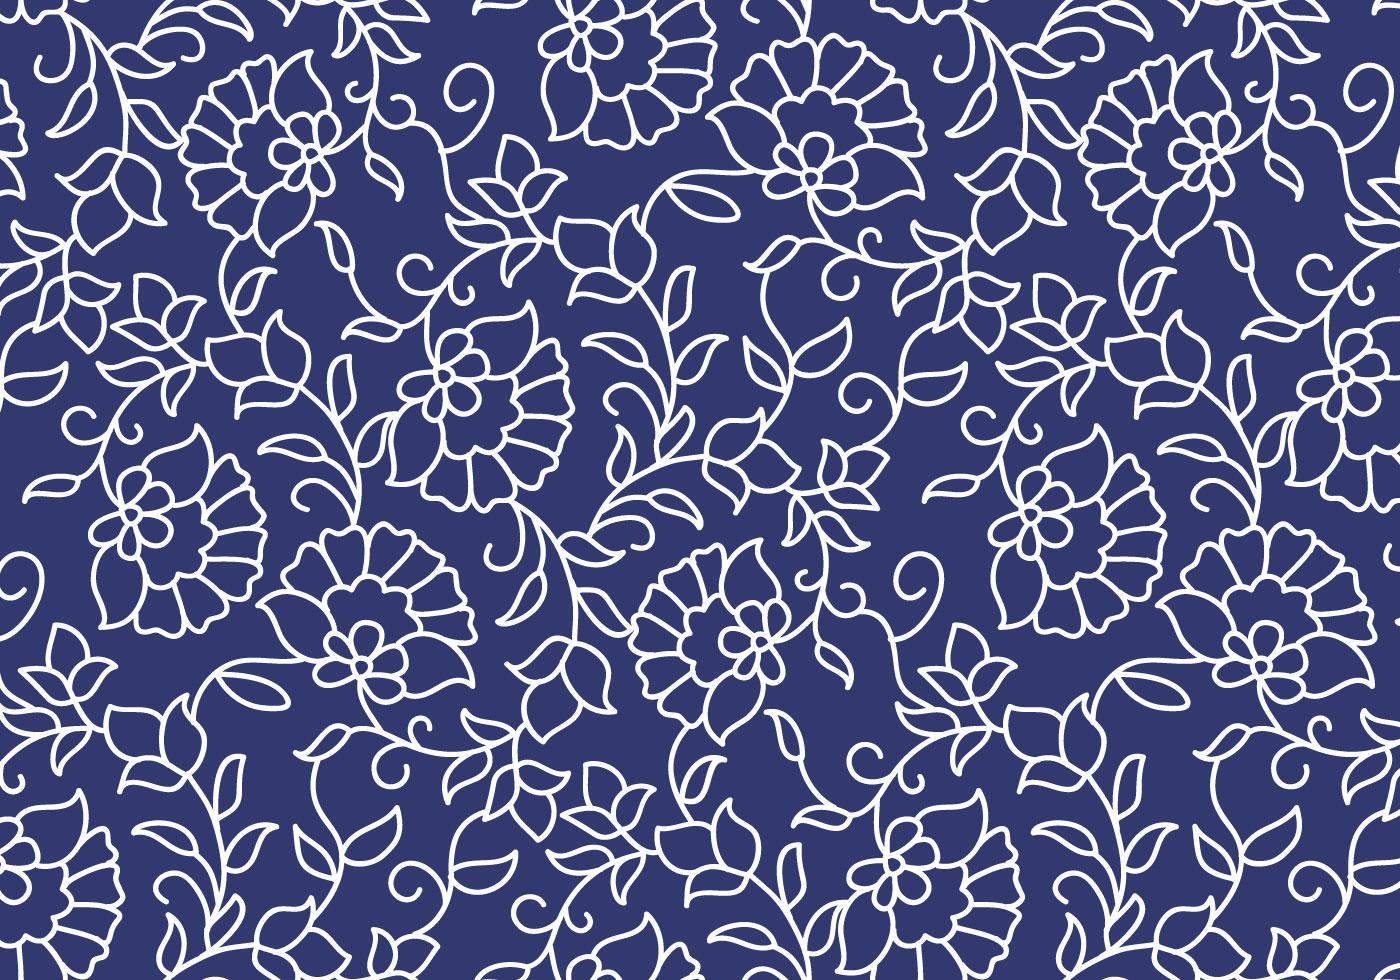 Outline Floral Pattern Download Free Vector Art Stock